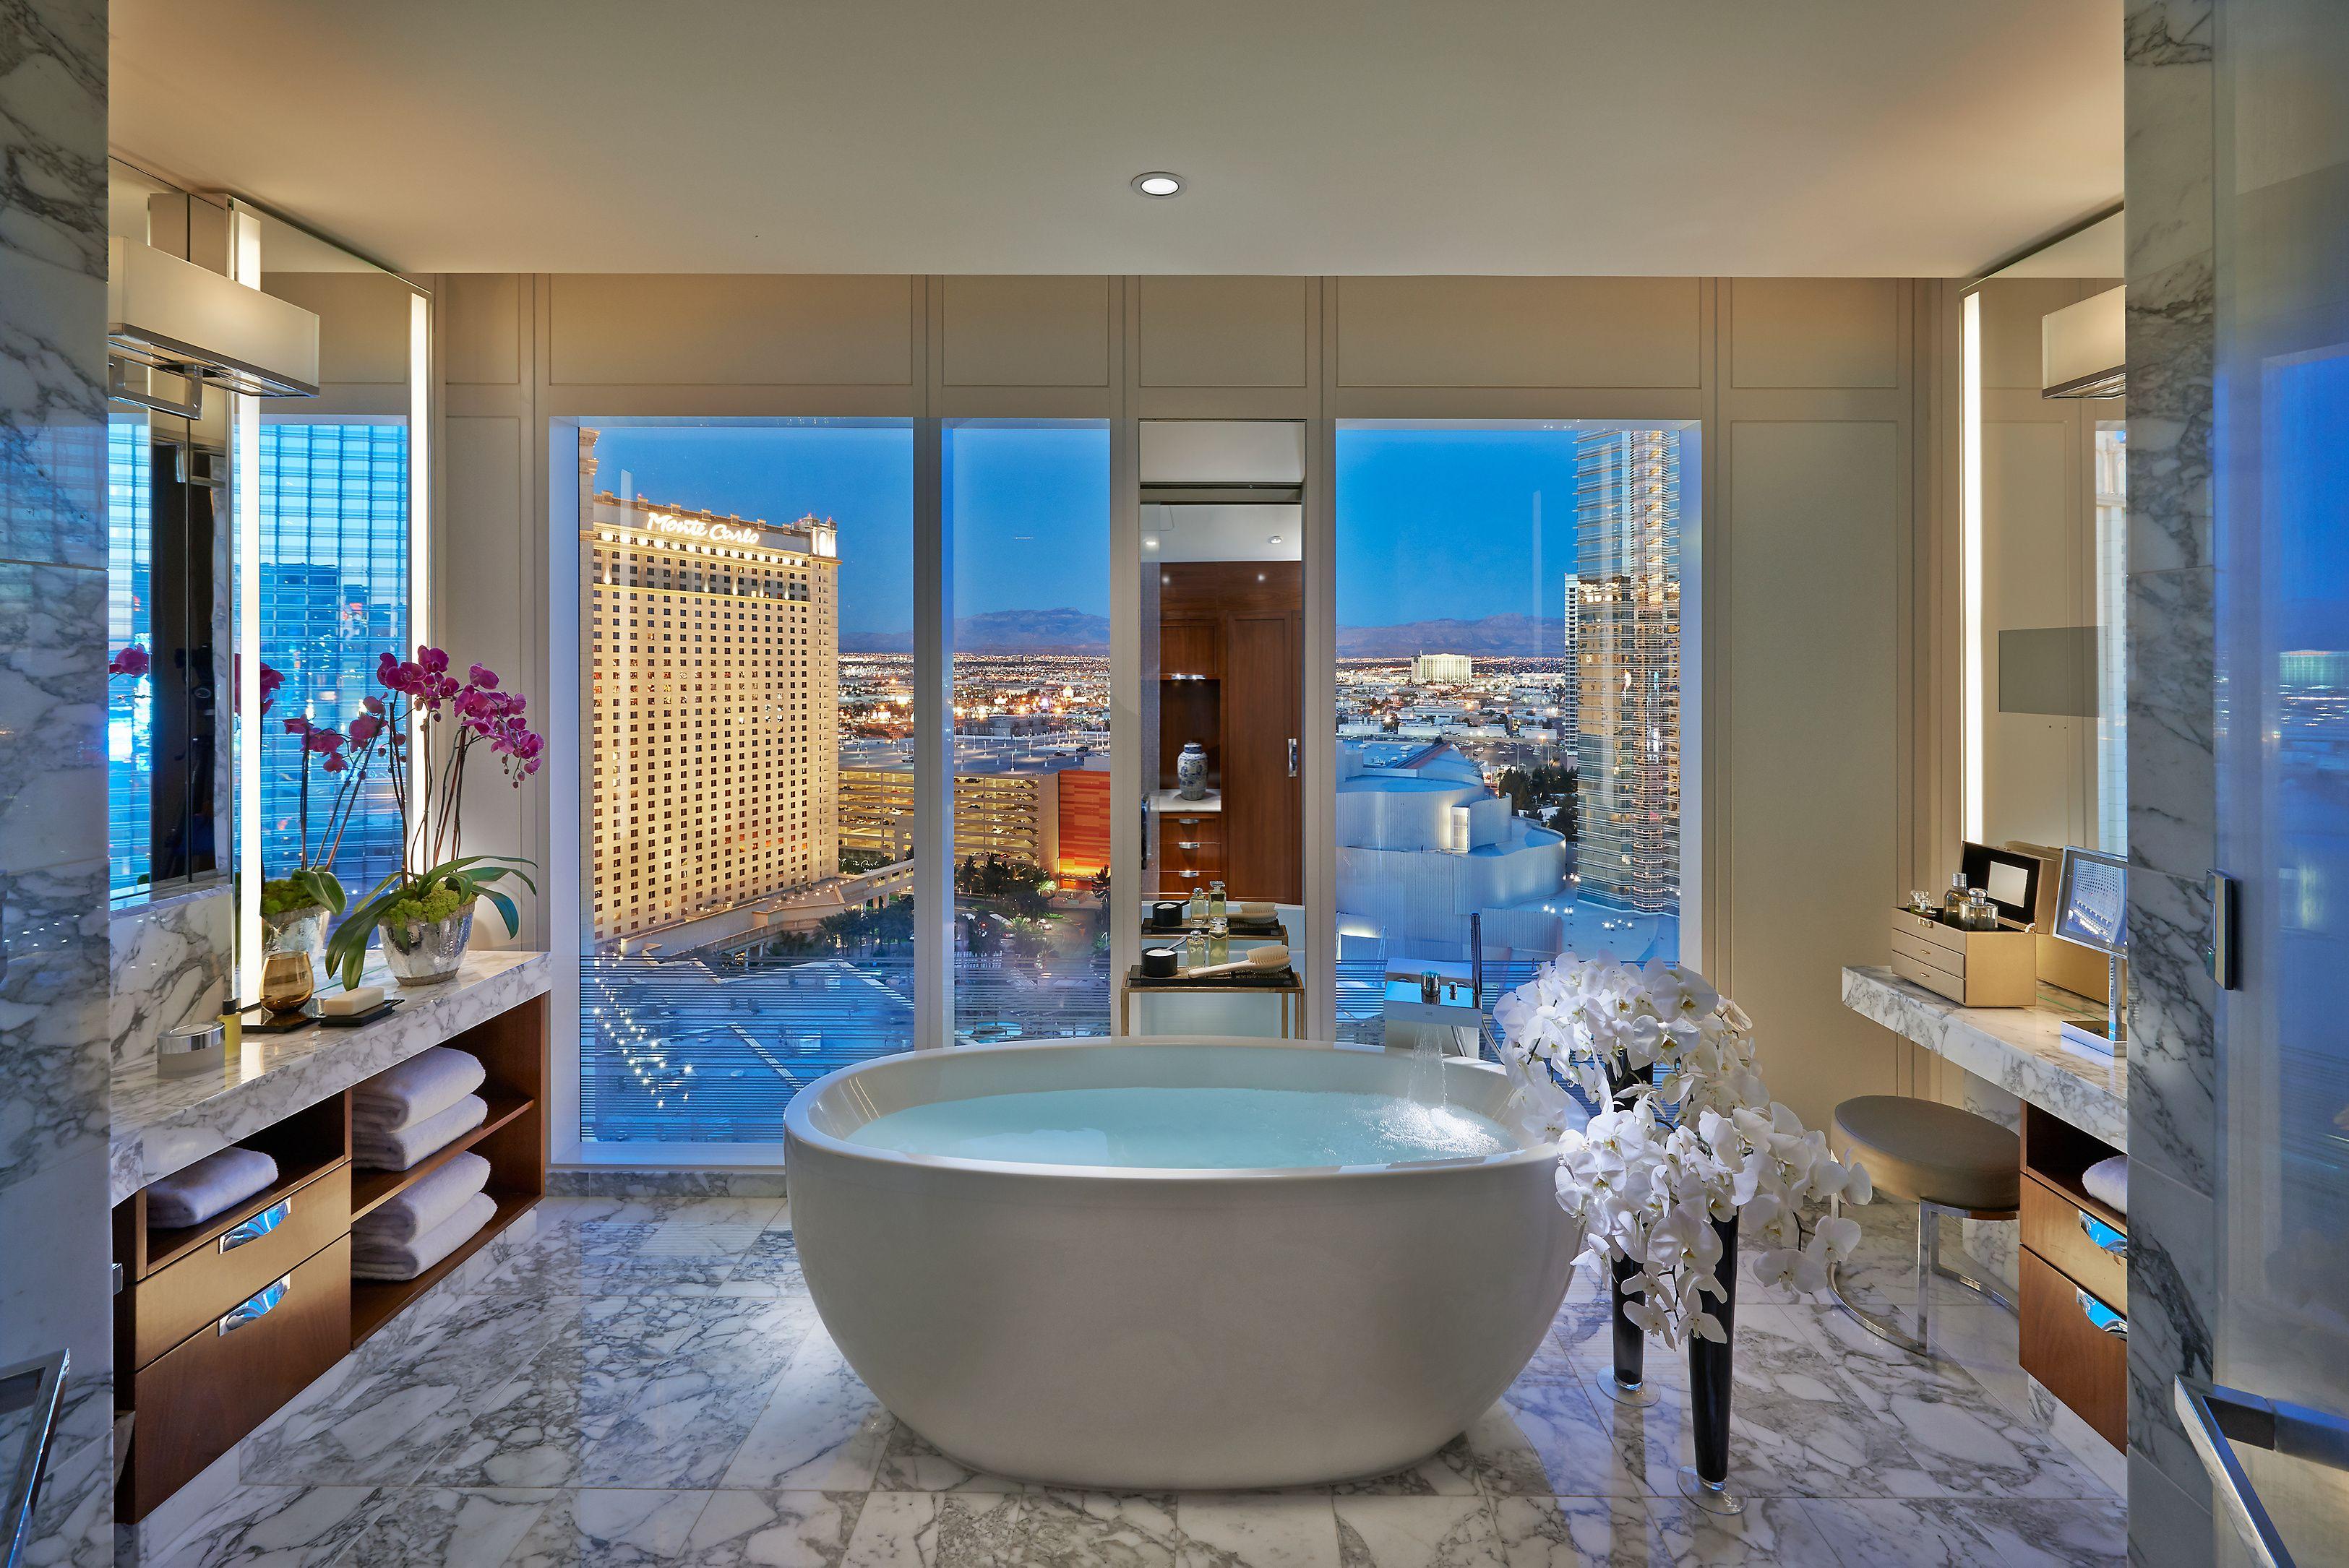 Mandarin Hotel Las Vegas bathroom | Mandarin Oriental LAs Vegas apex ...